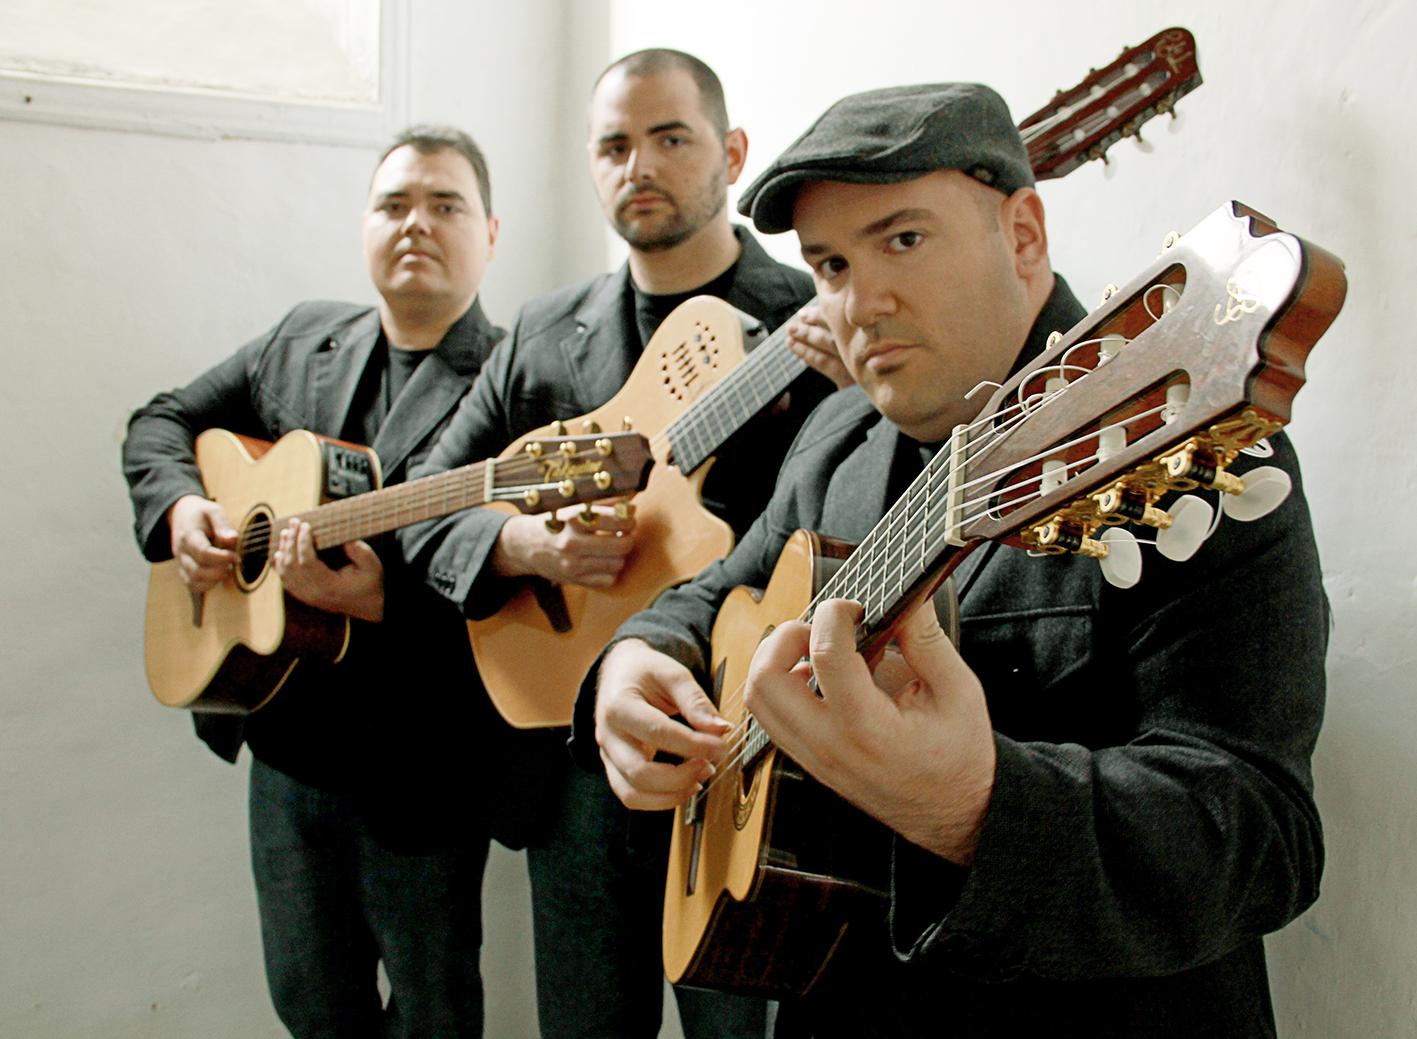 Alma de Bolero cierra la gira Déjate Querer en el Teatro Leal de La Laguna